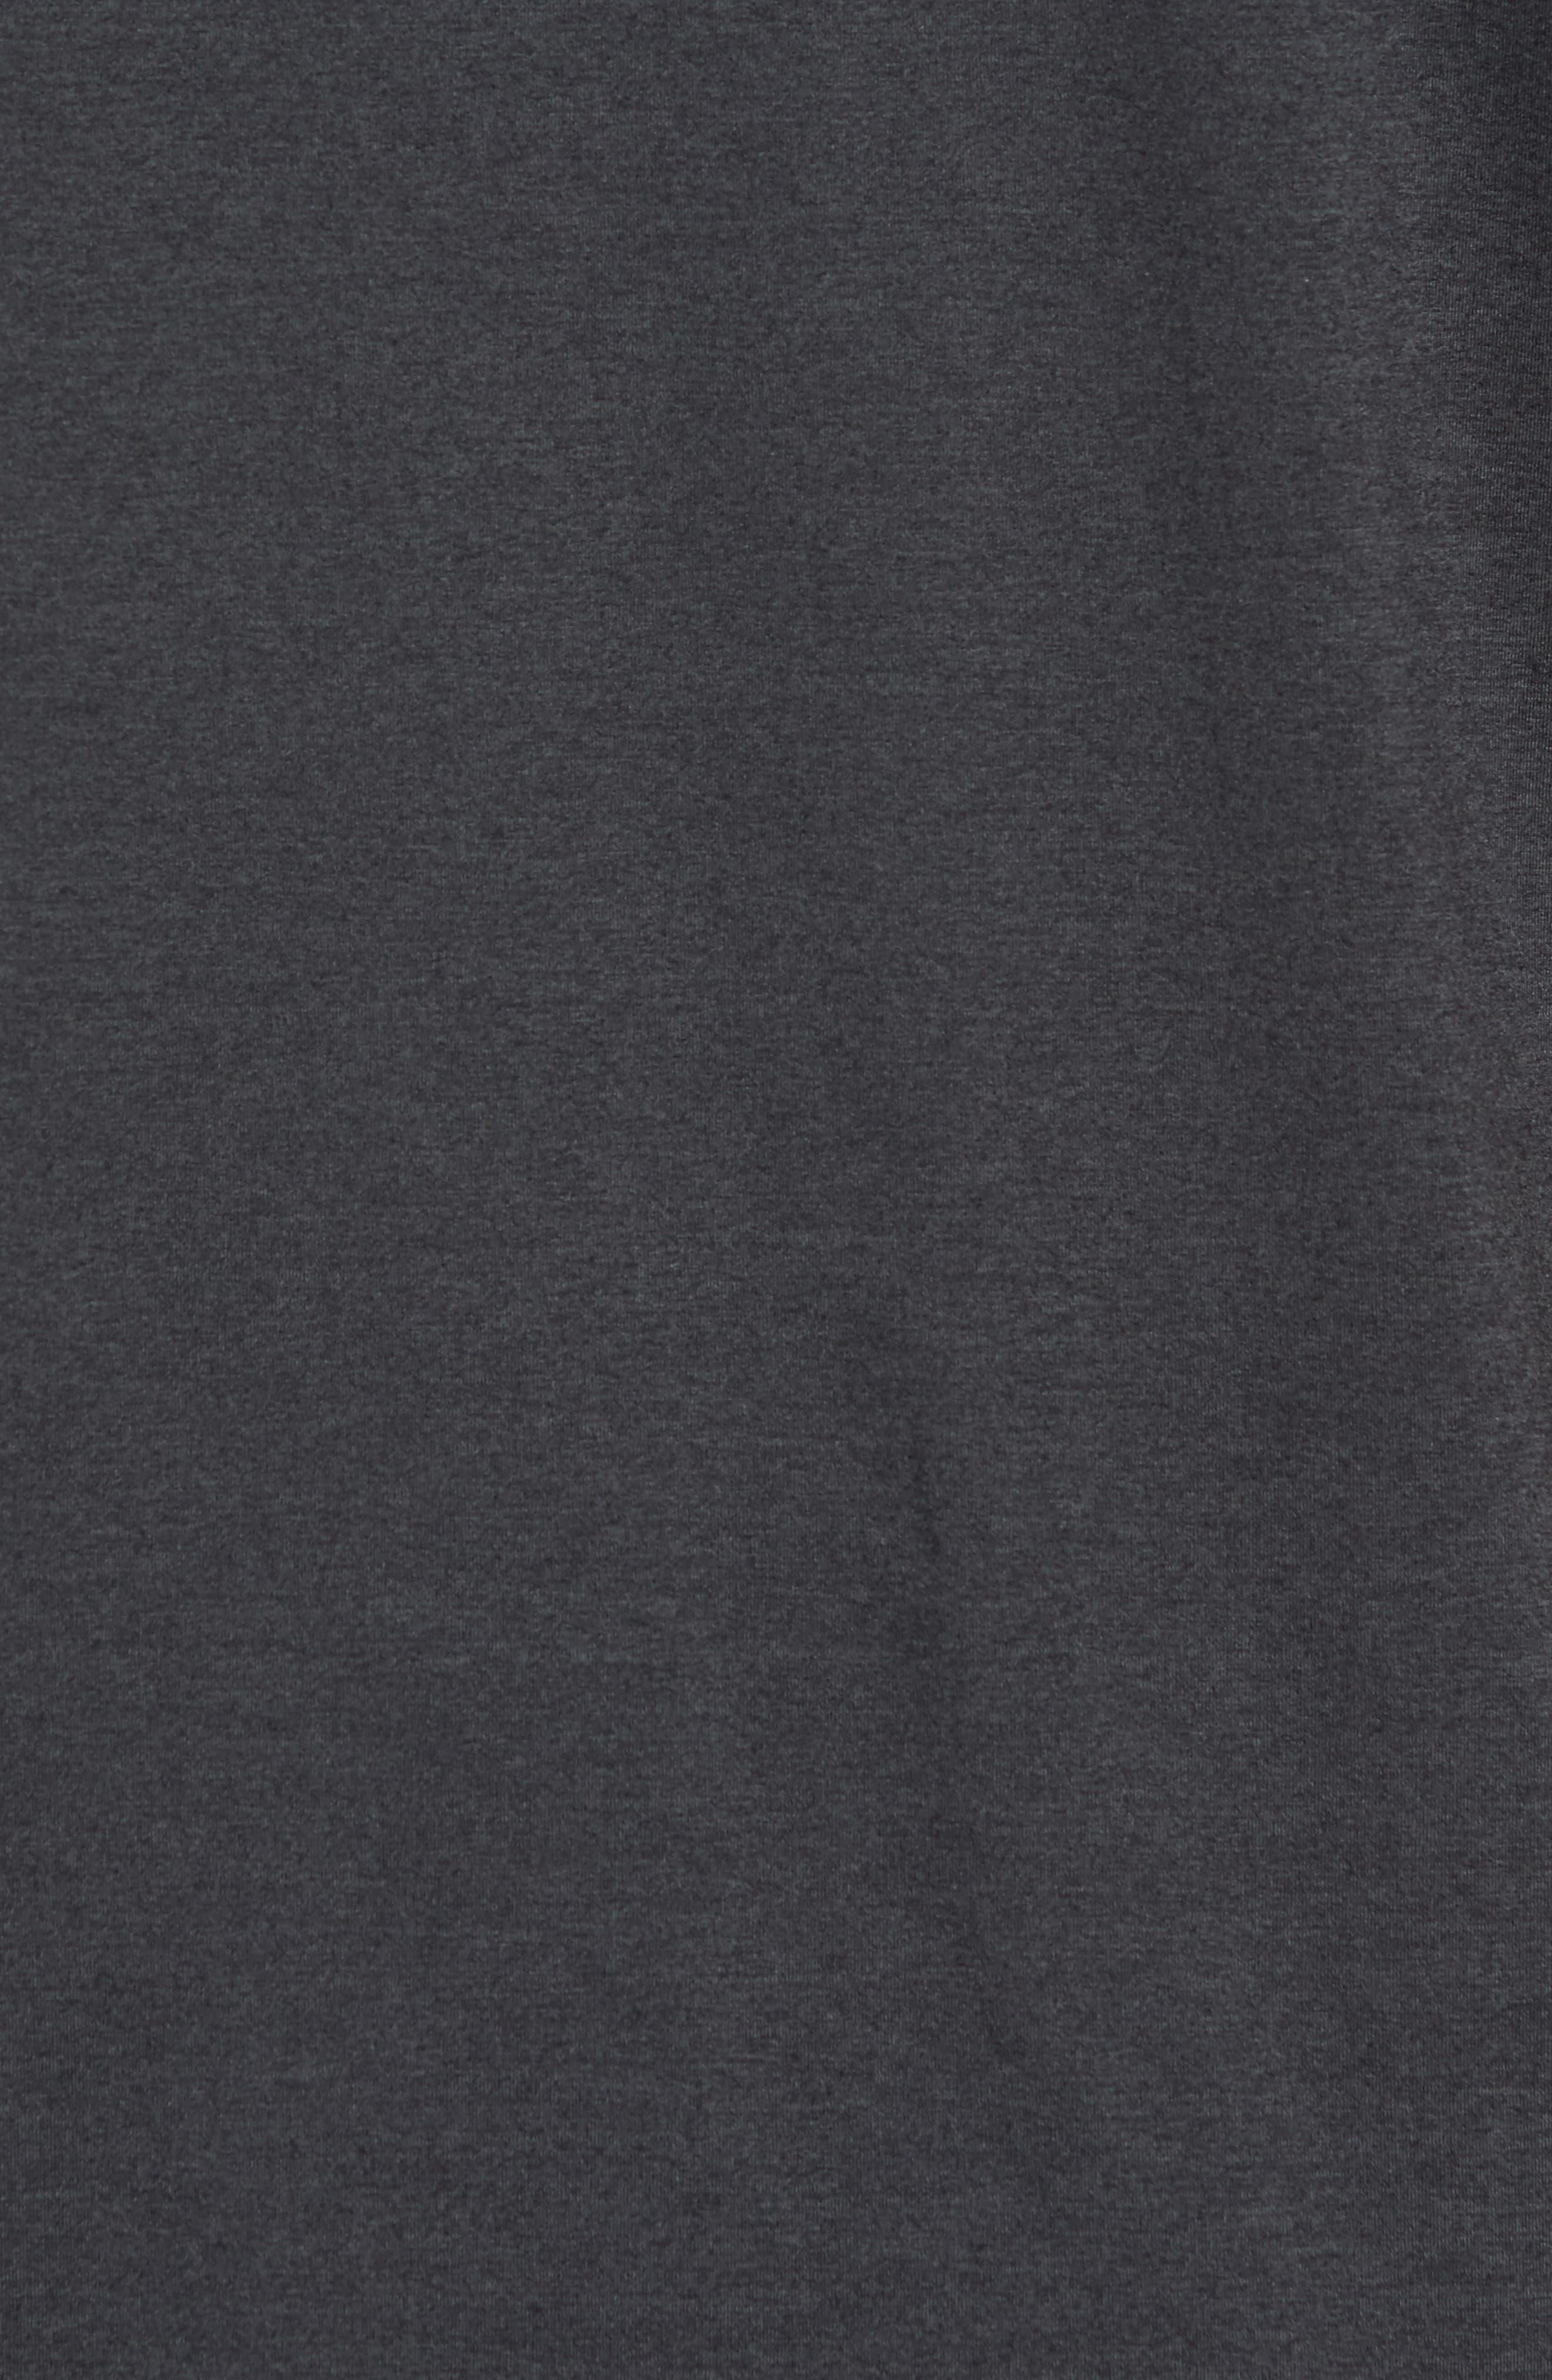 Dry Max Training T-Shirt,                             Alternate thumbnail 5, color,                             BLACK/ ANTHRACITE/ COBALT